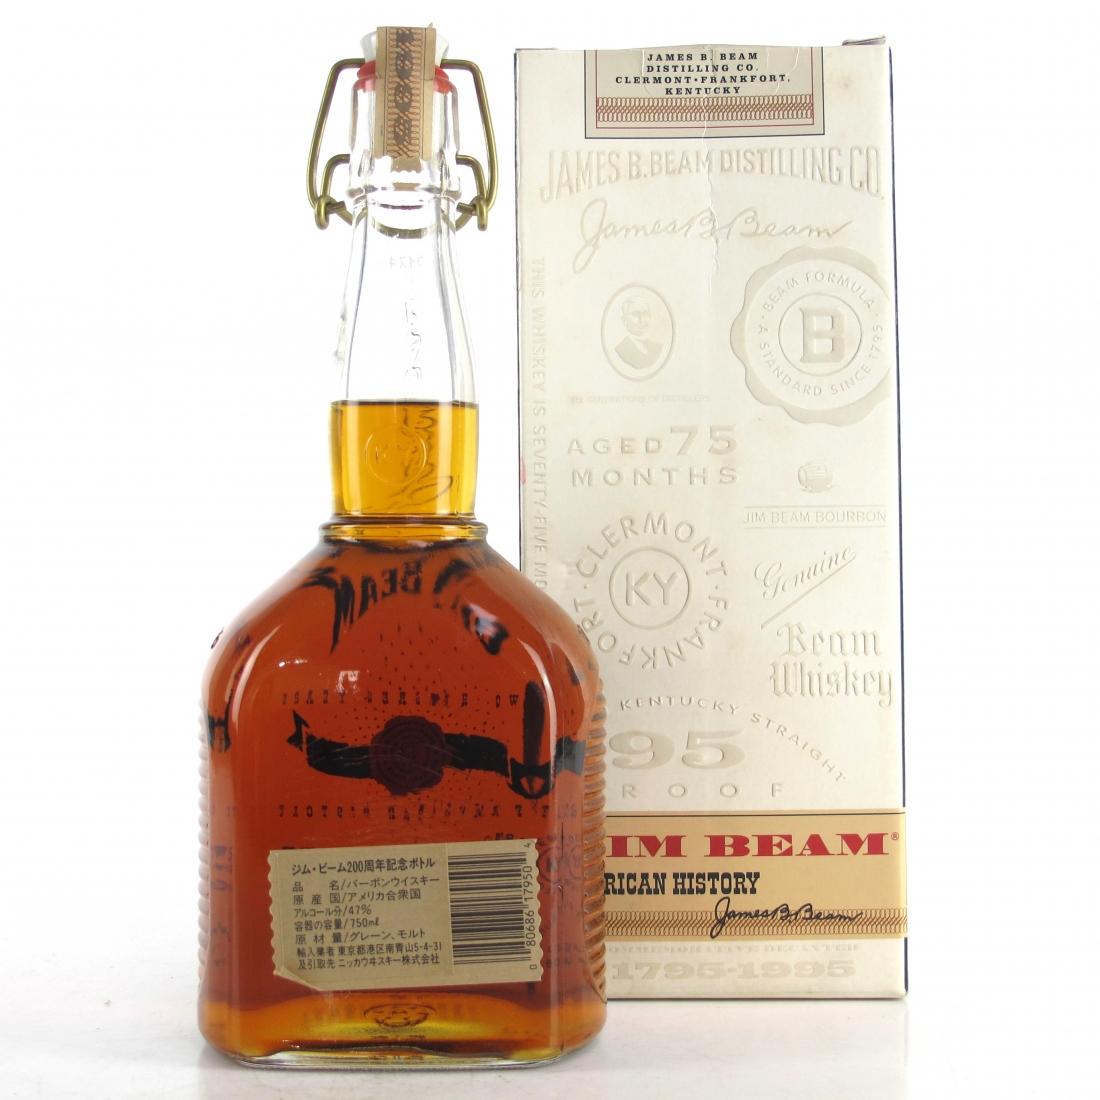 Jim Beam 200 Years of American History Decanter 1795 - 1995